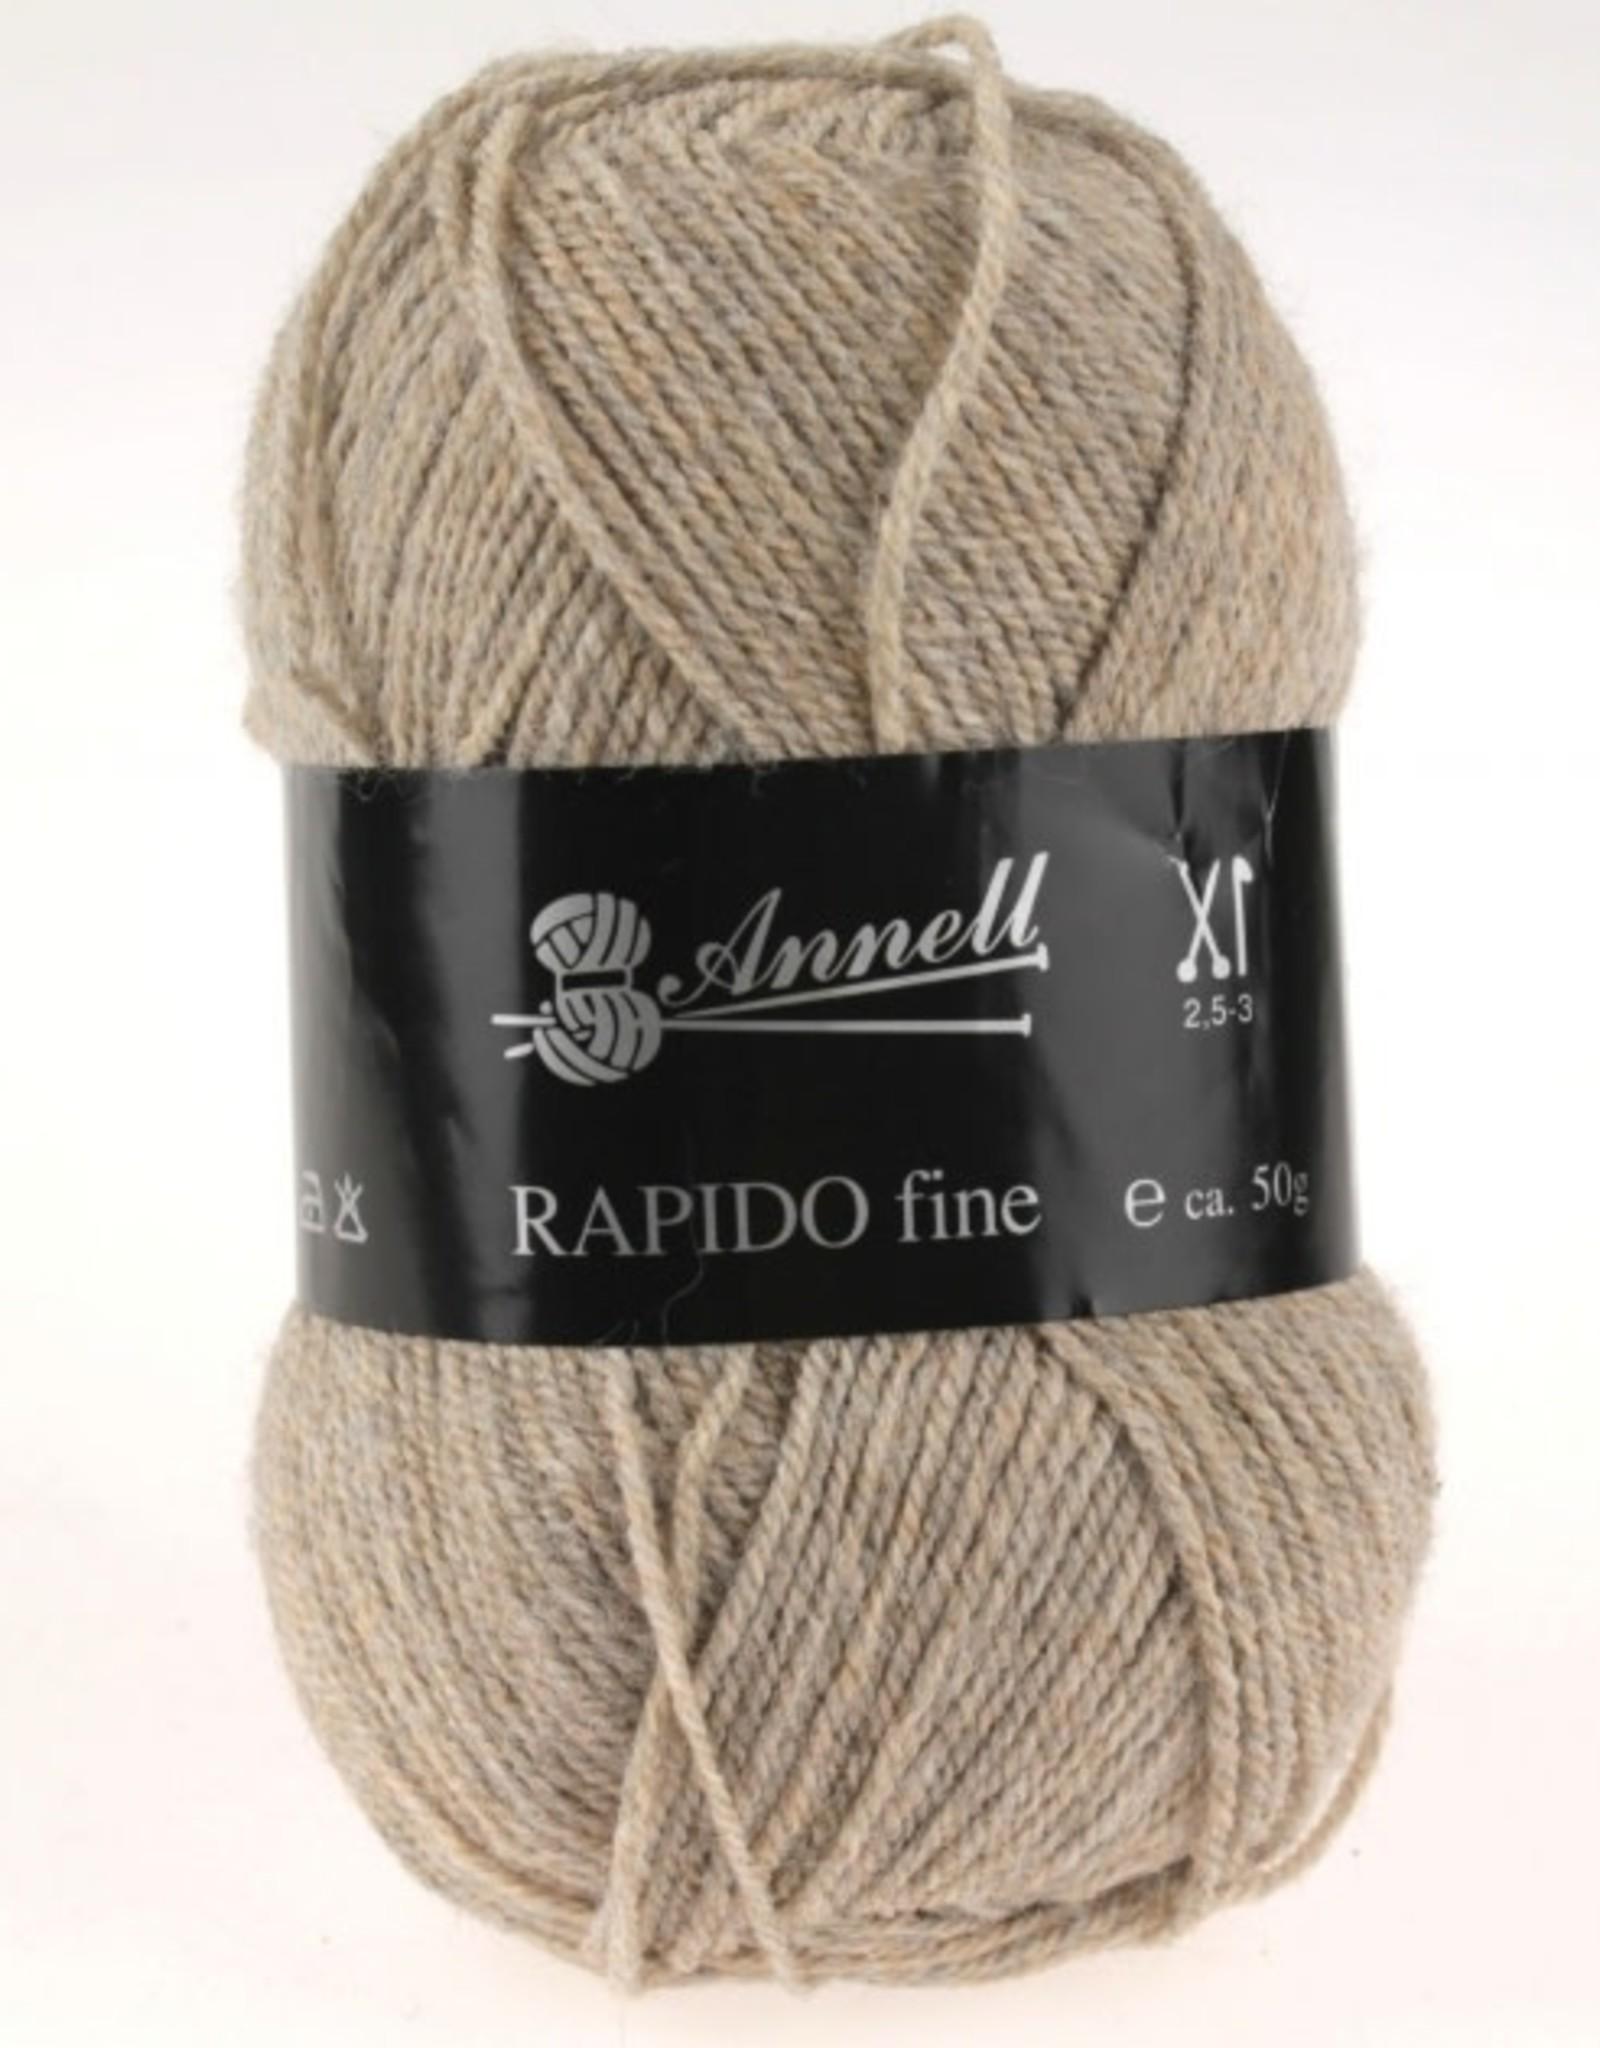 Annell Annell rapido fine 8330